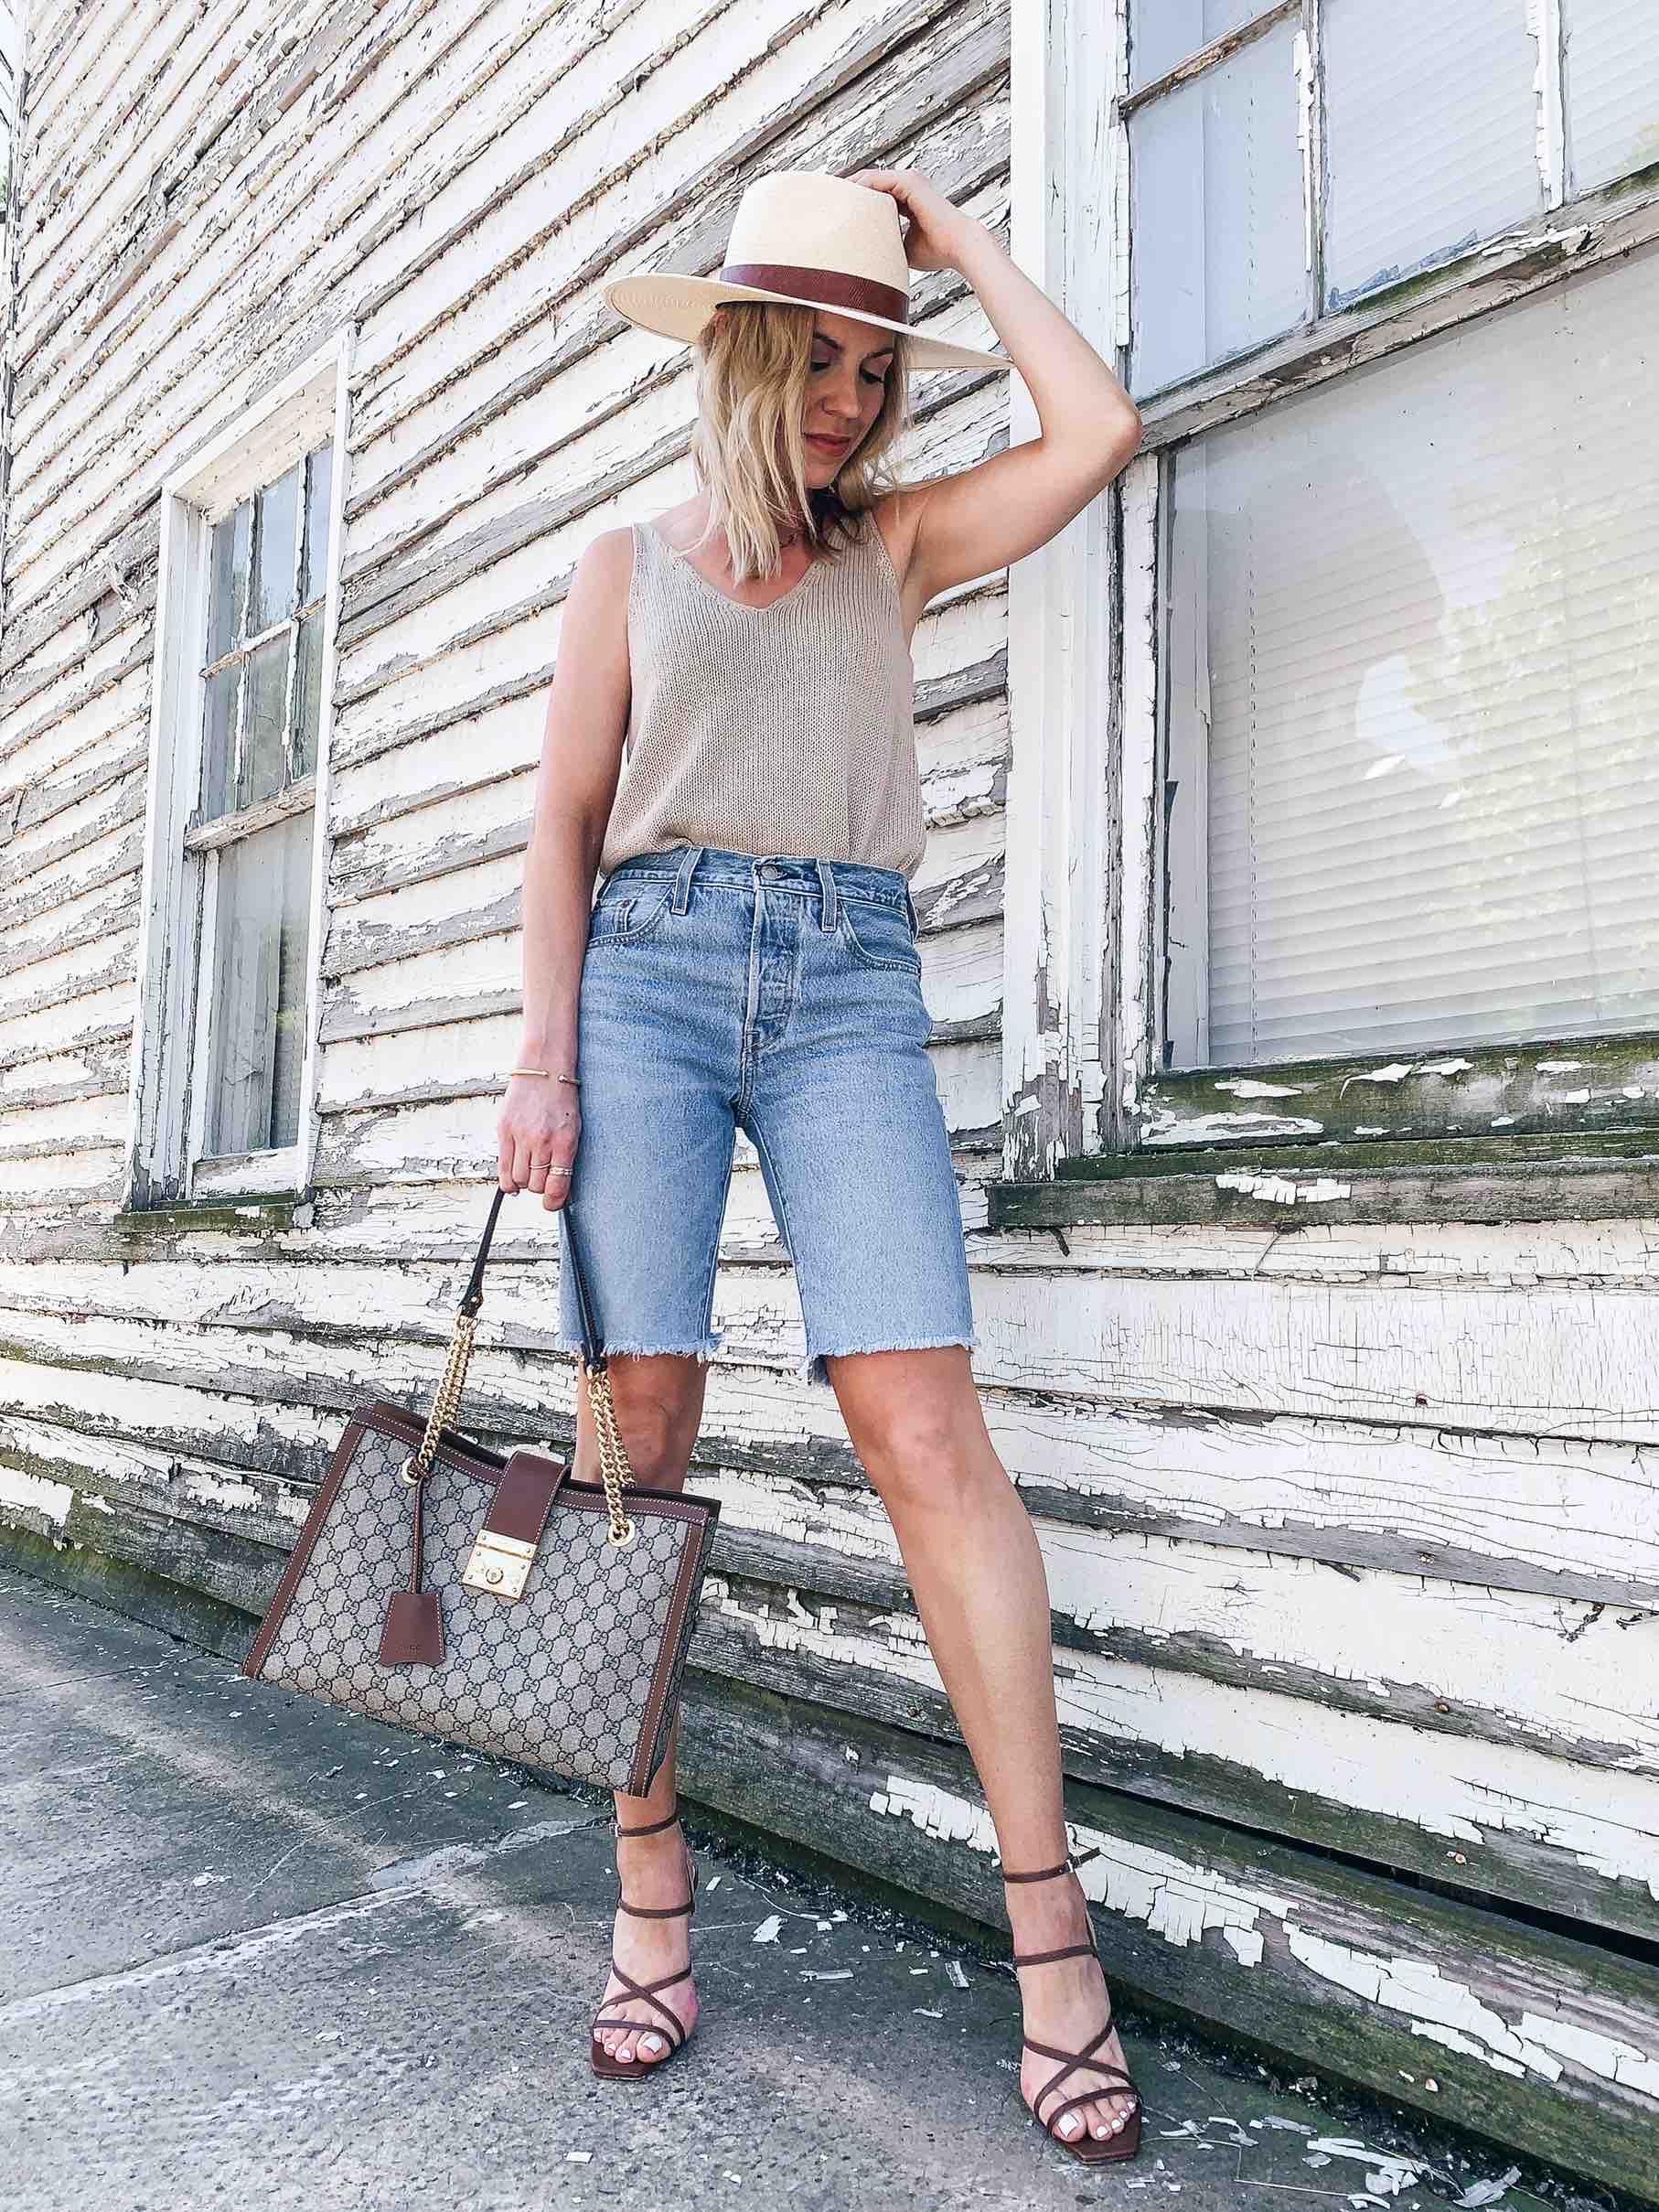 Meagan Brandon fashion blogger of Meagan's Moda wears Levi's knee length shorts with stiletto heels, how to wear bermuda shorts and look stylish - Meagan's Moda